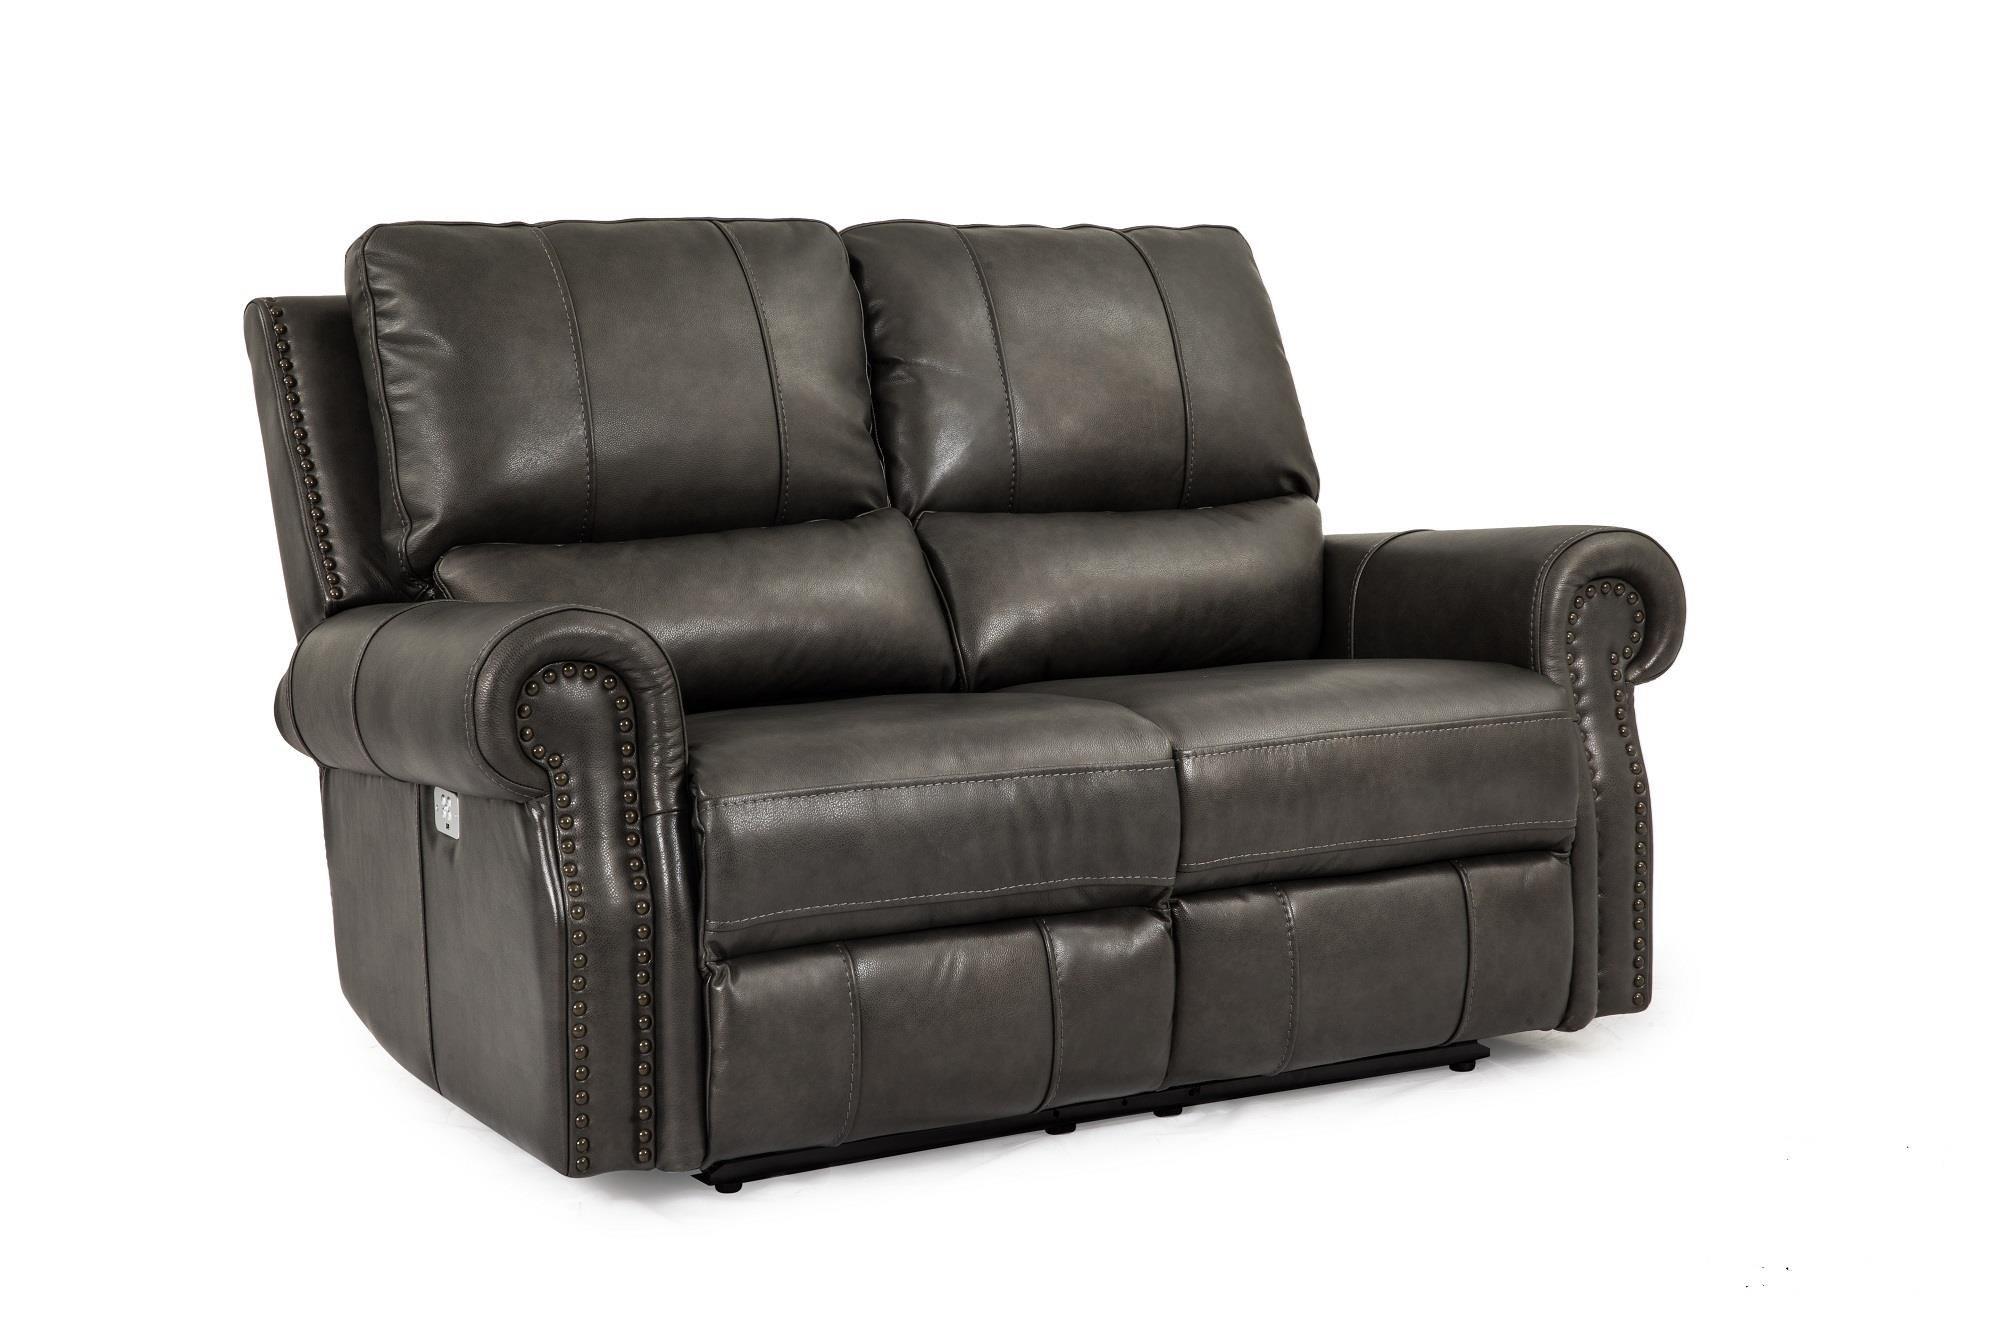 Cheers Sofa Steel Reclining Loveseat w/Pwr Head & Foot - Item Number: UXW9919HM L2-2EH 30604